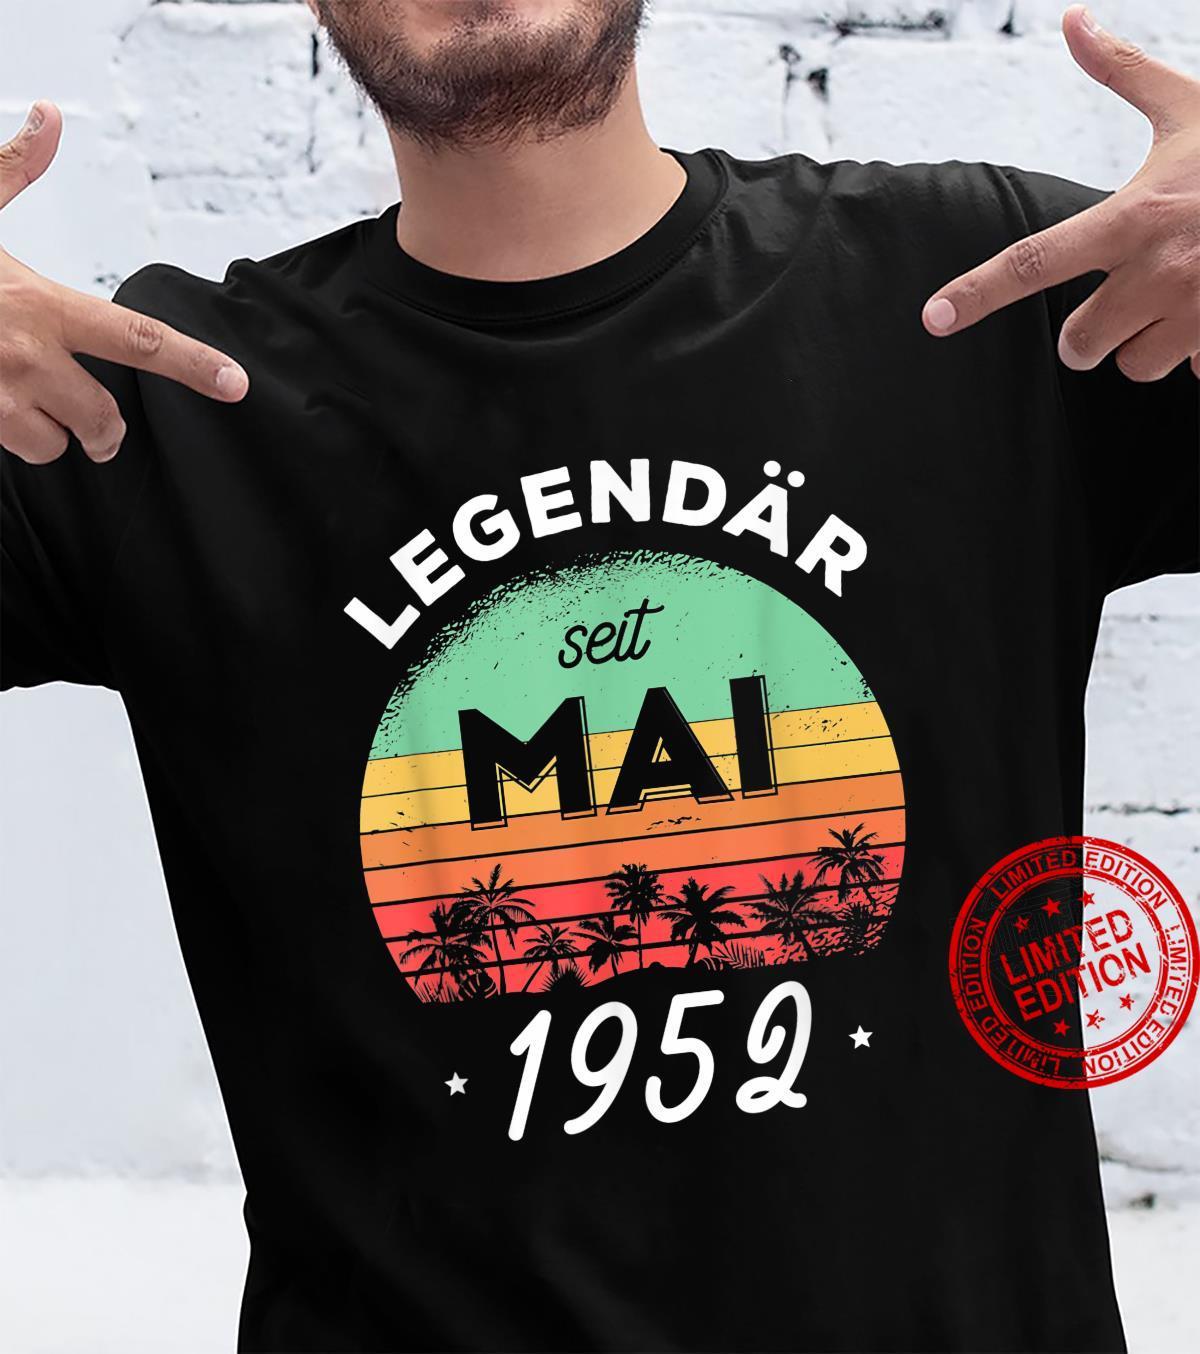 69. Geburtstag Legendär seit Mai 1952 Shirt